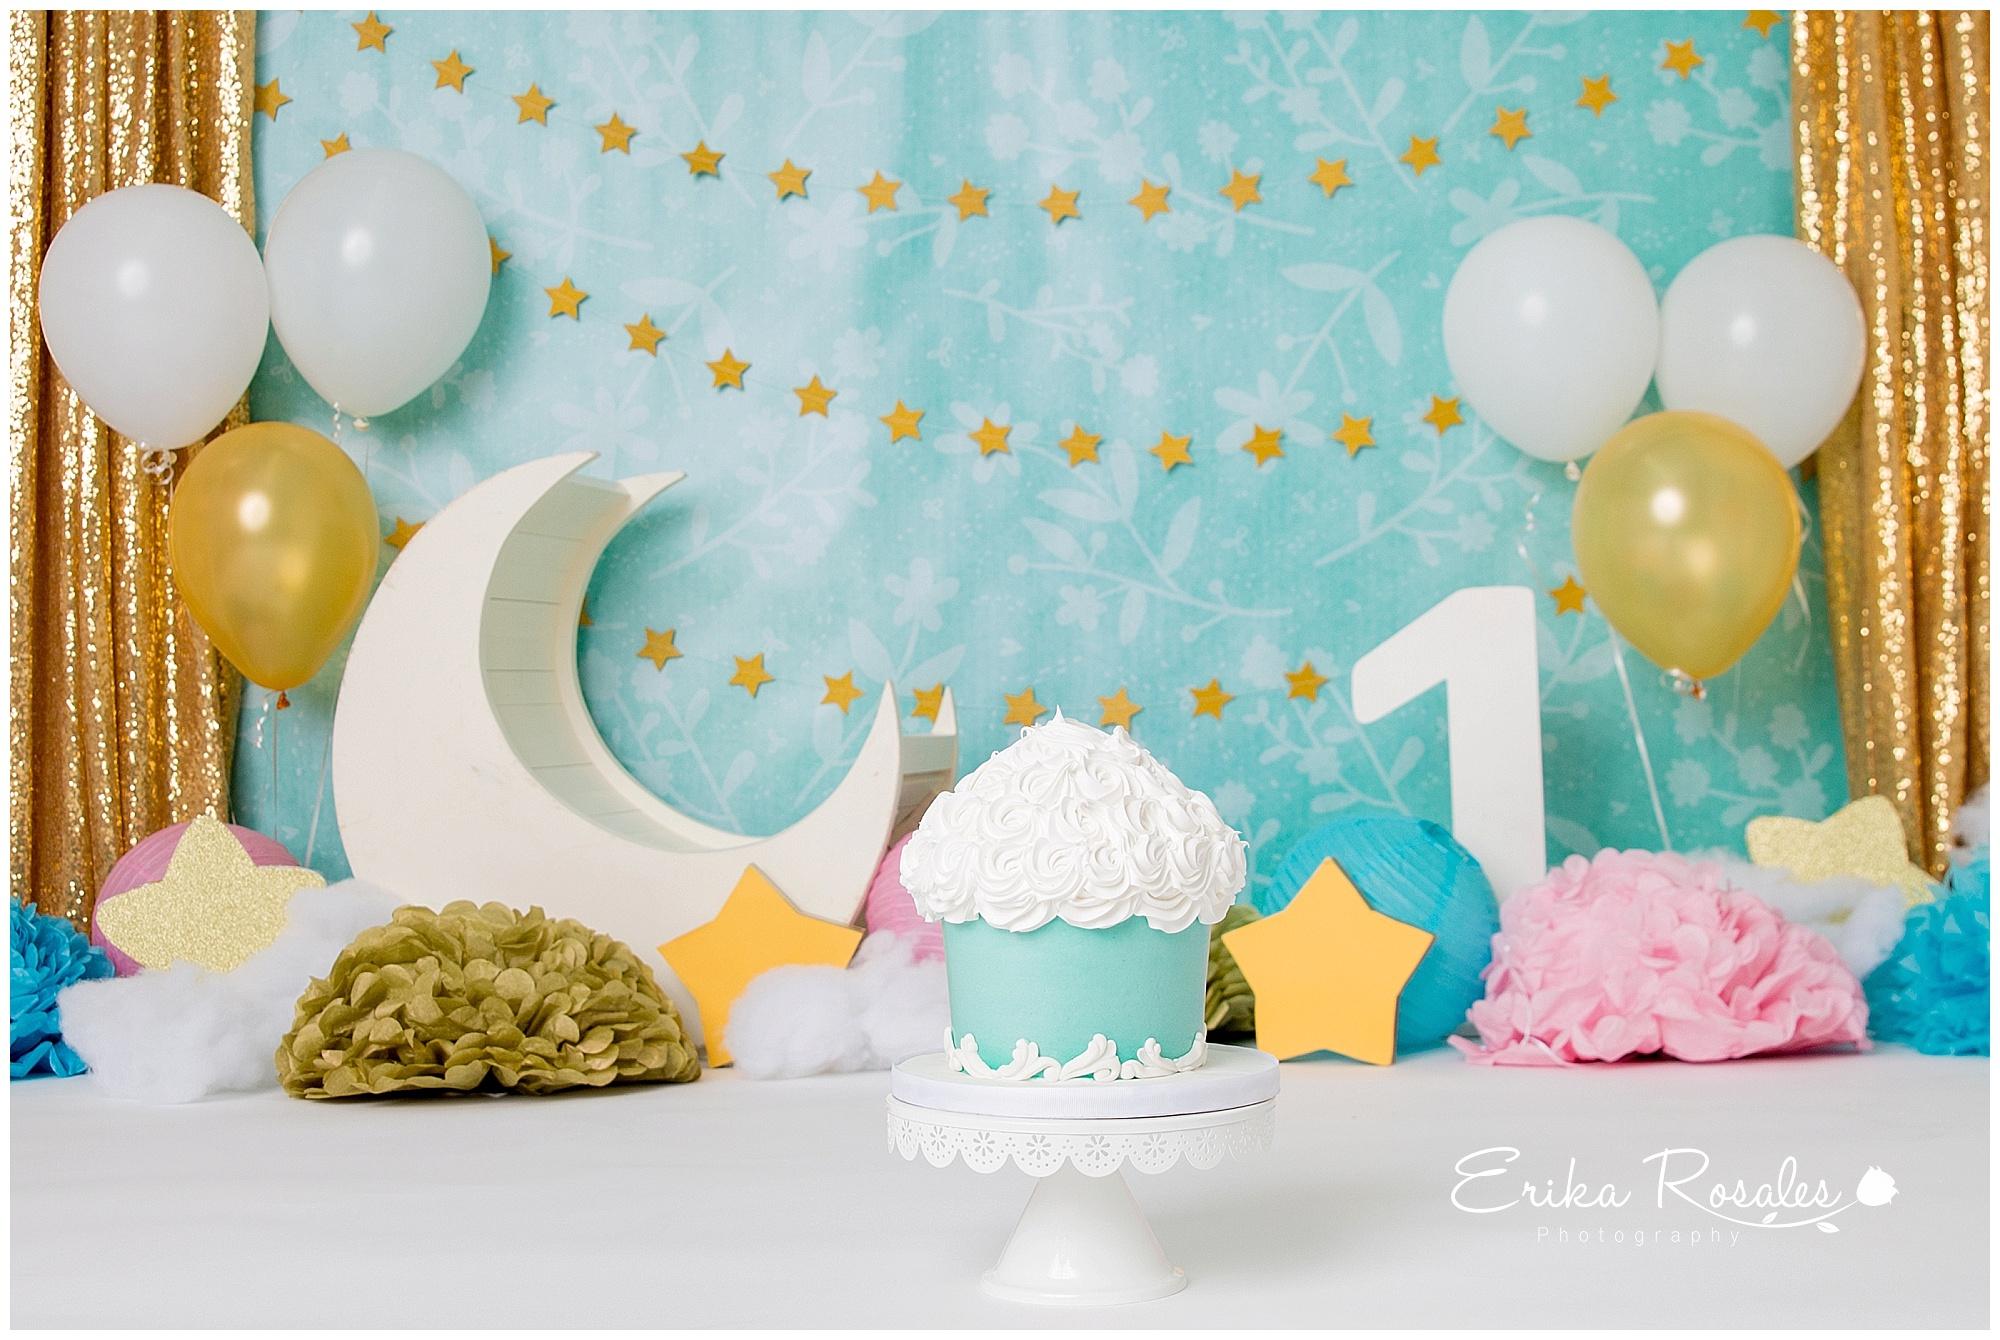 Cake Smash Twinkle Twinkle Little Star Theme Twin Boy And